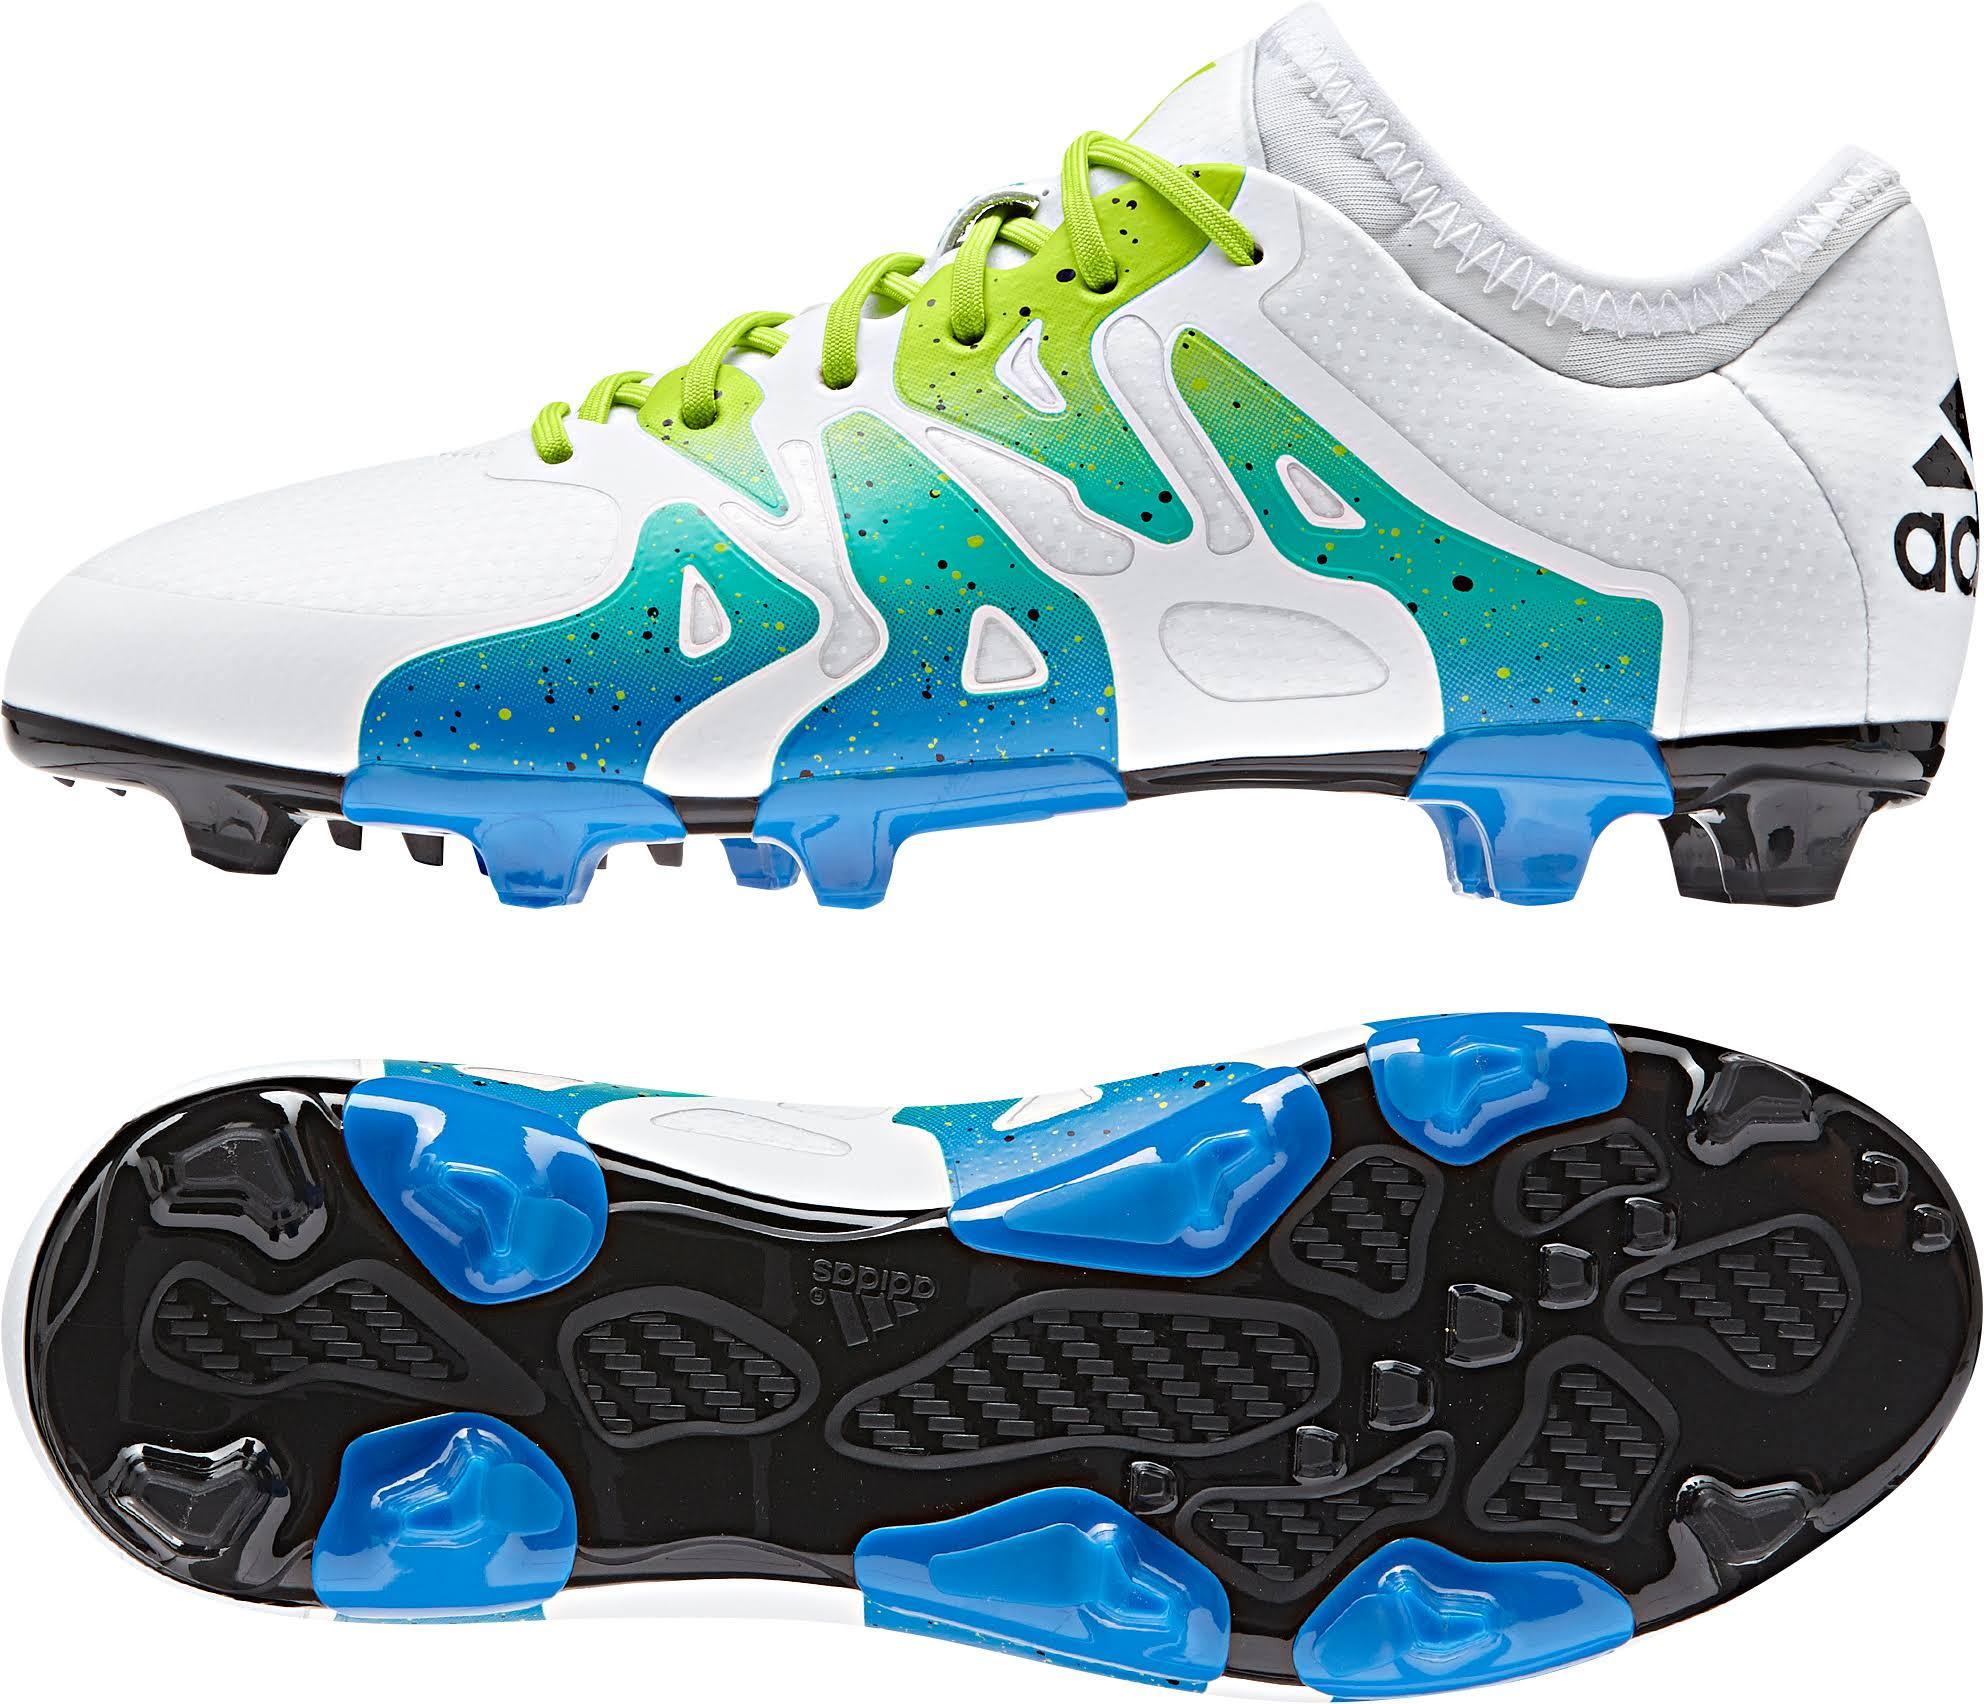 Adidas Firme Ag 1 Para Botas X Junior Fútbol Suelo Blanco De 15 RncnZSEw